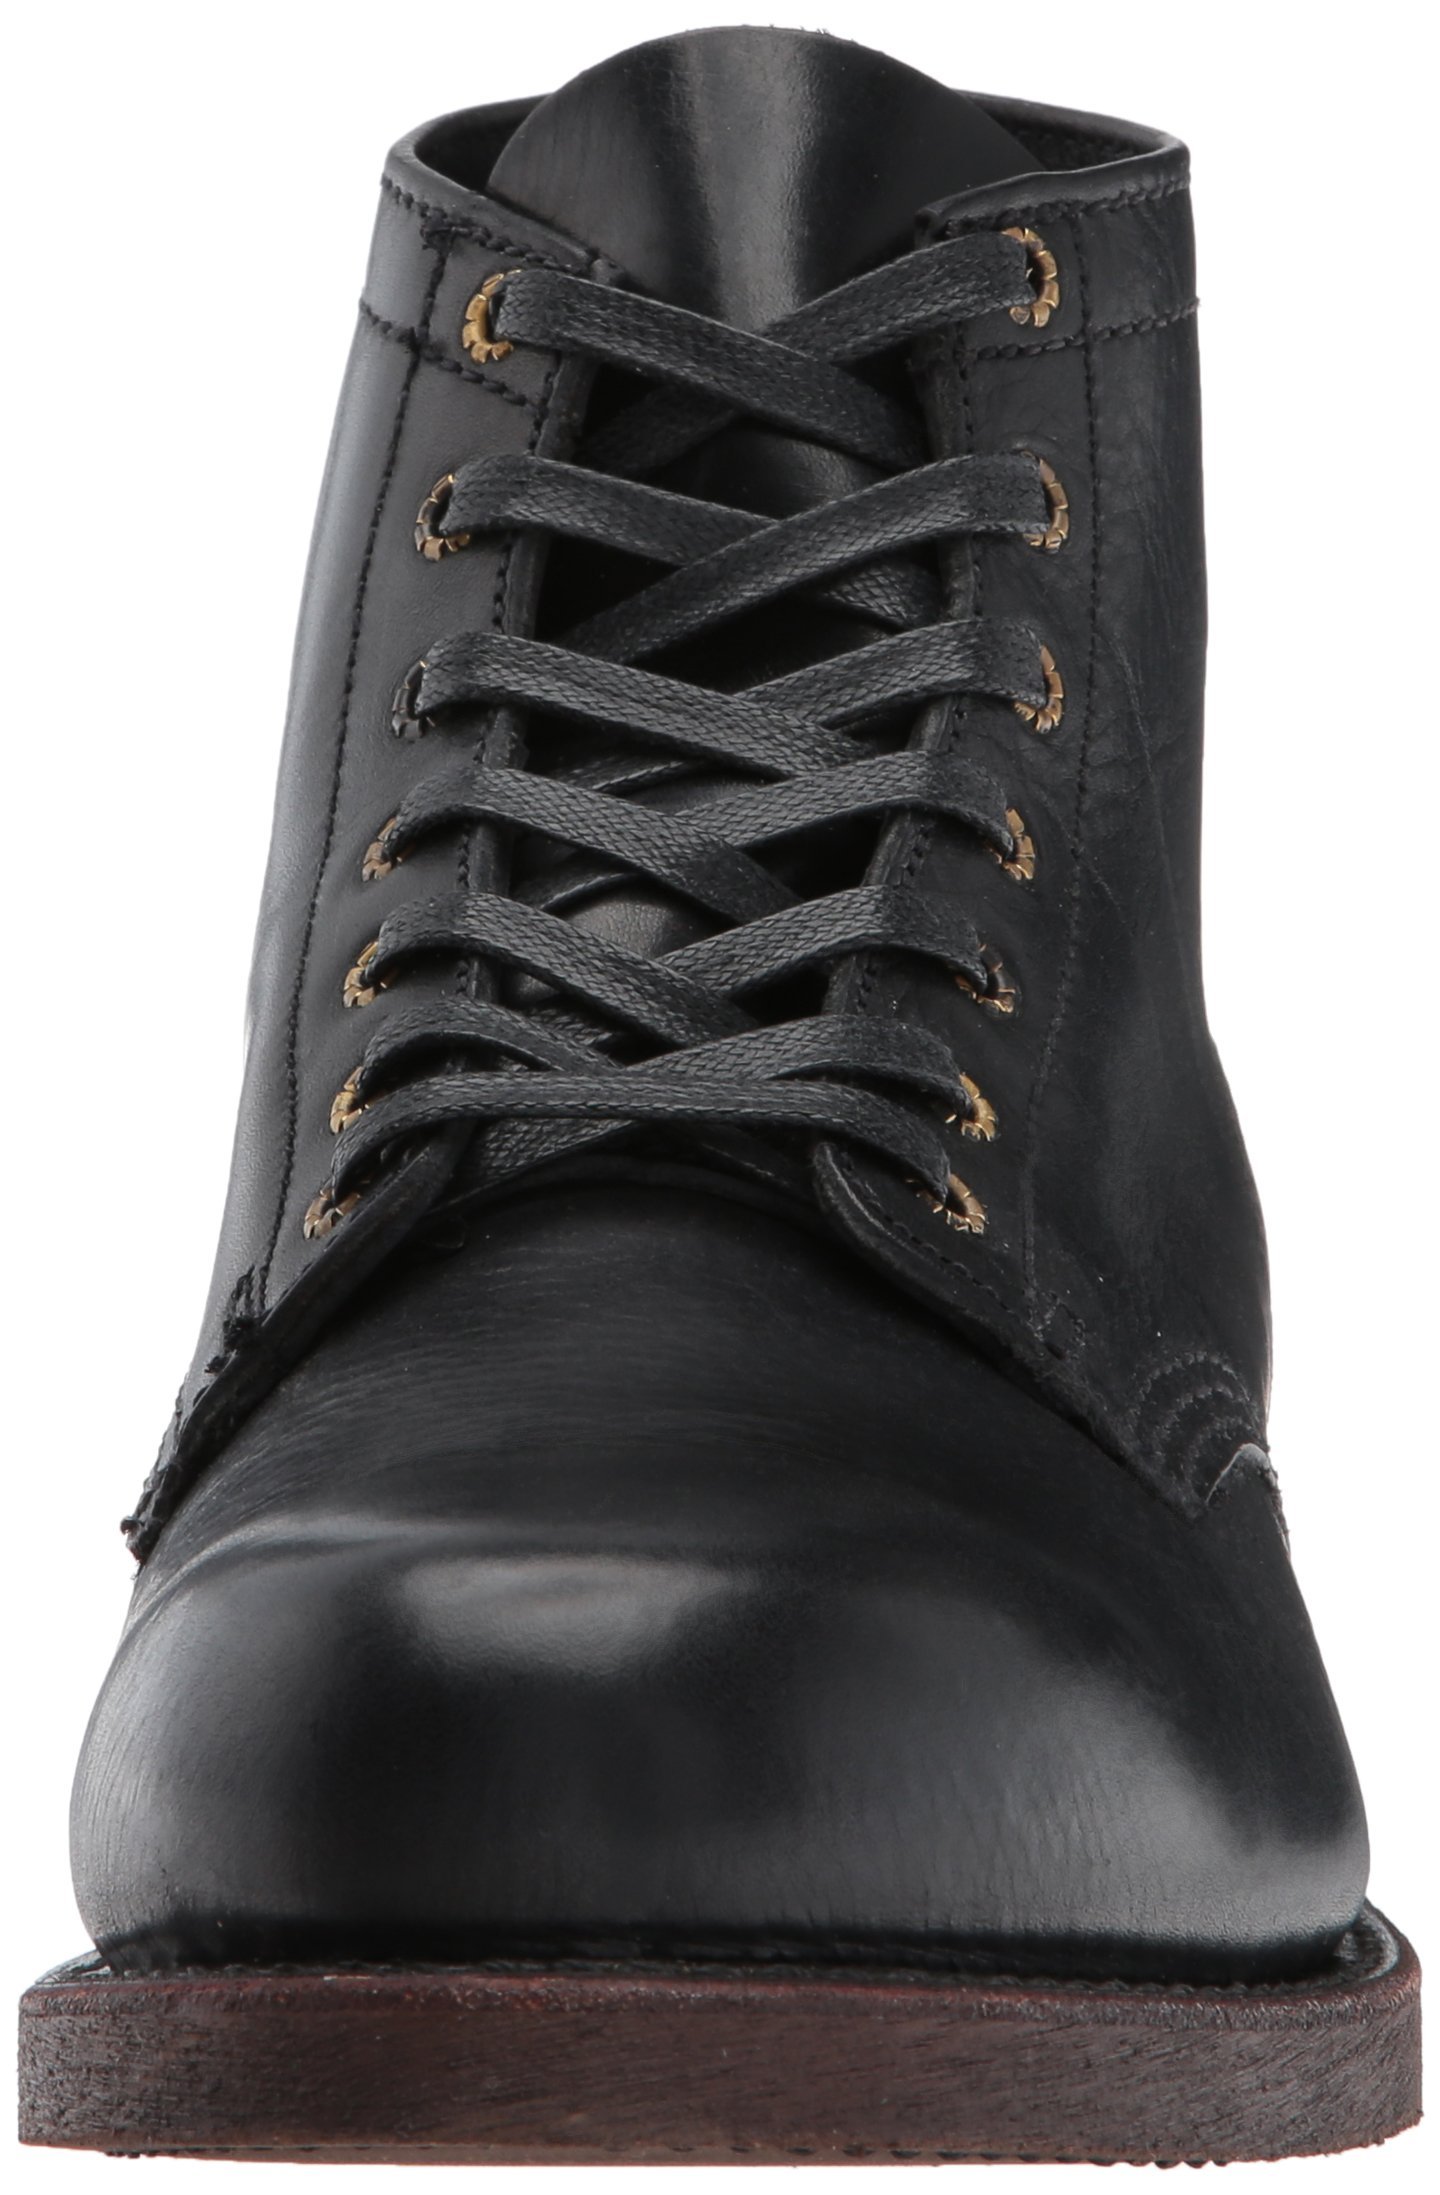 FRYE Men's Prison Combat Boot Black 10.5 D US by FRYE (Image #4)